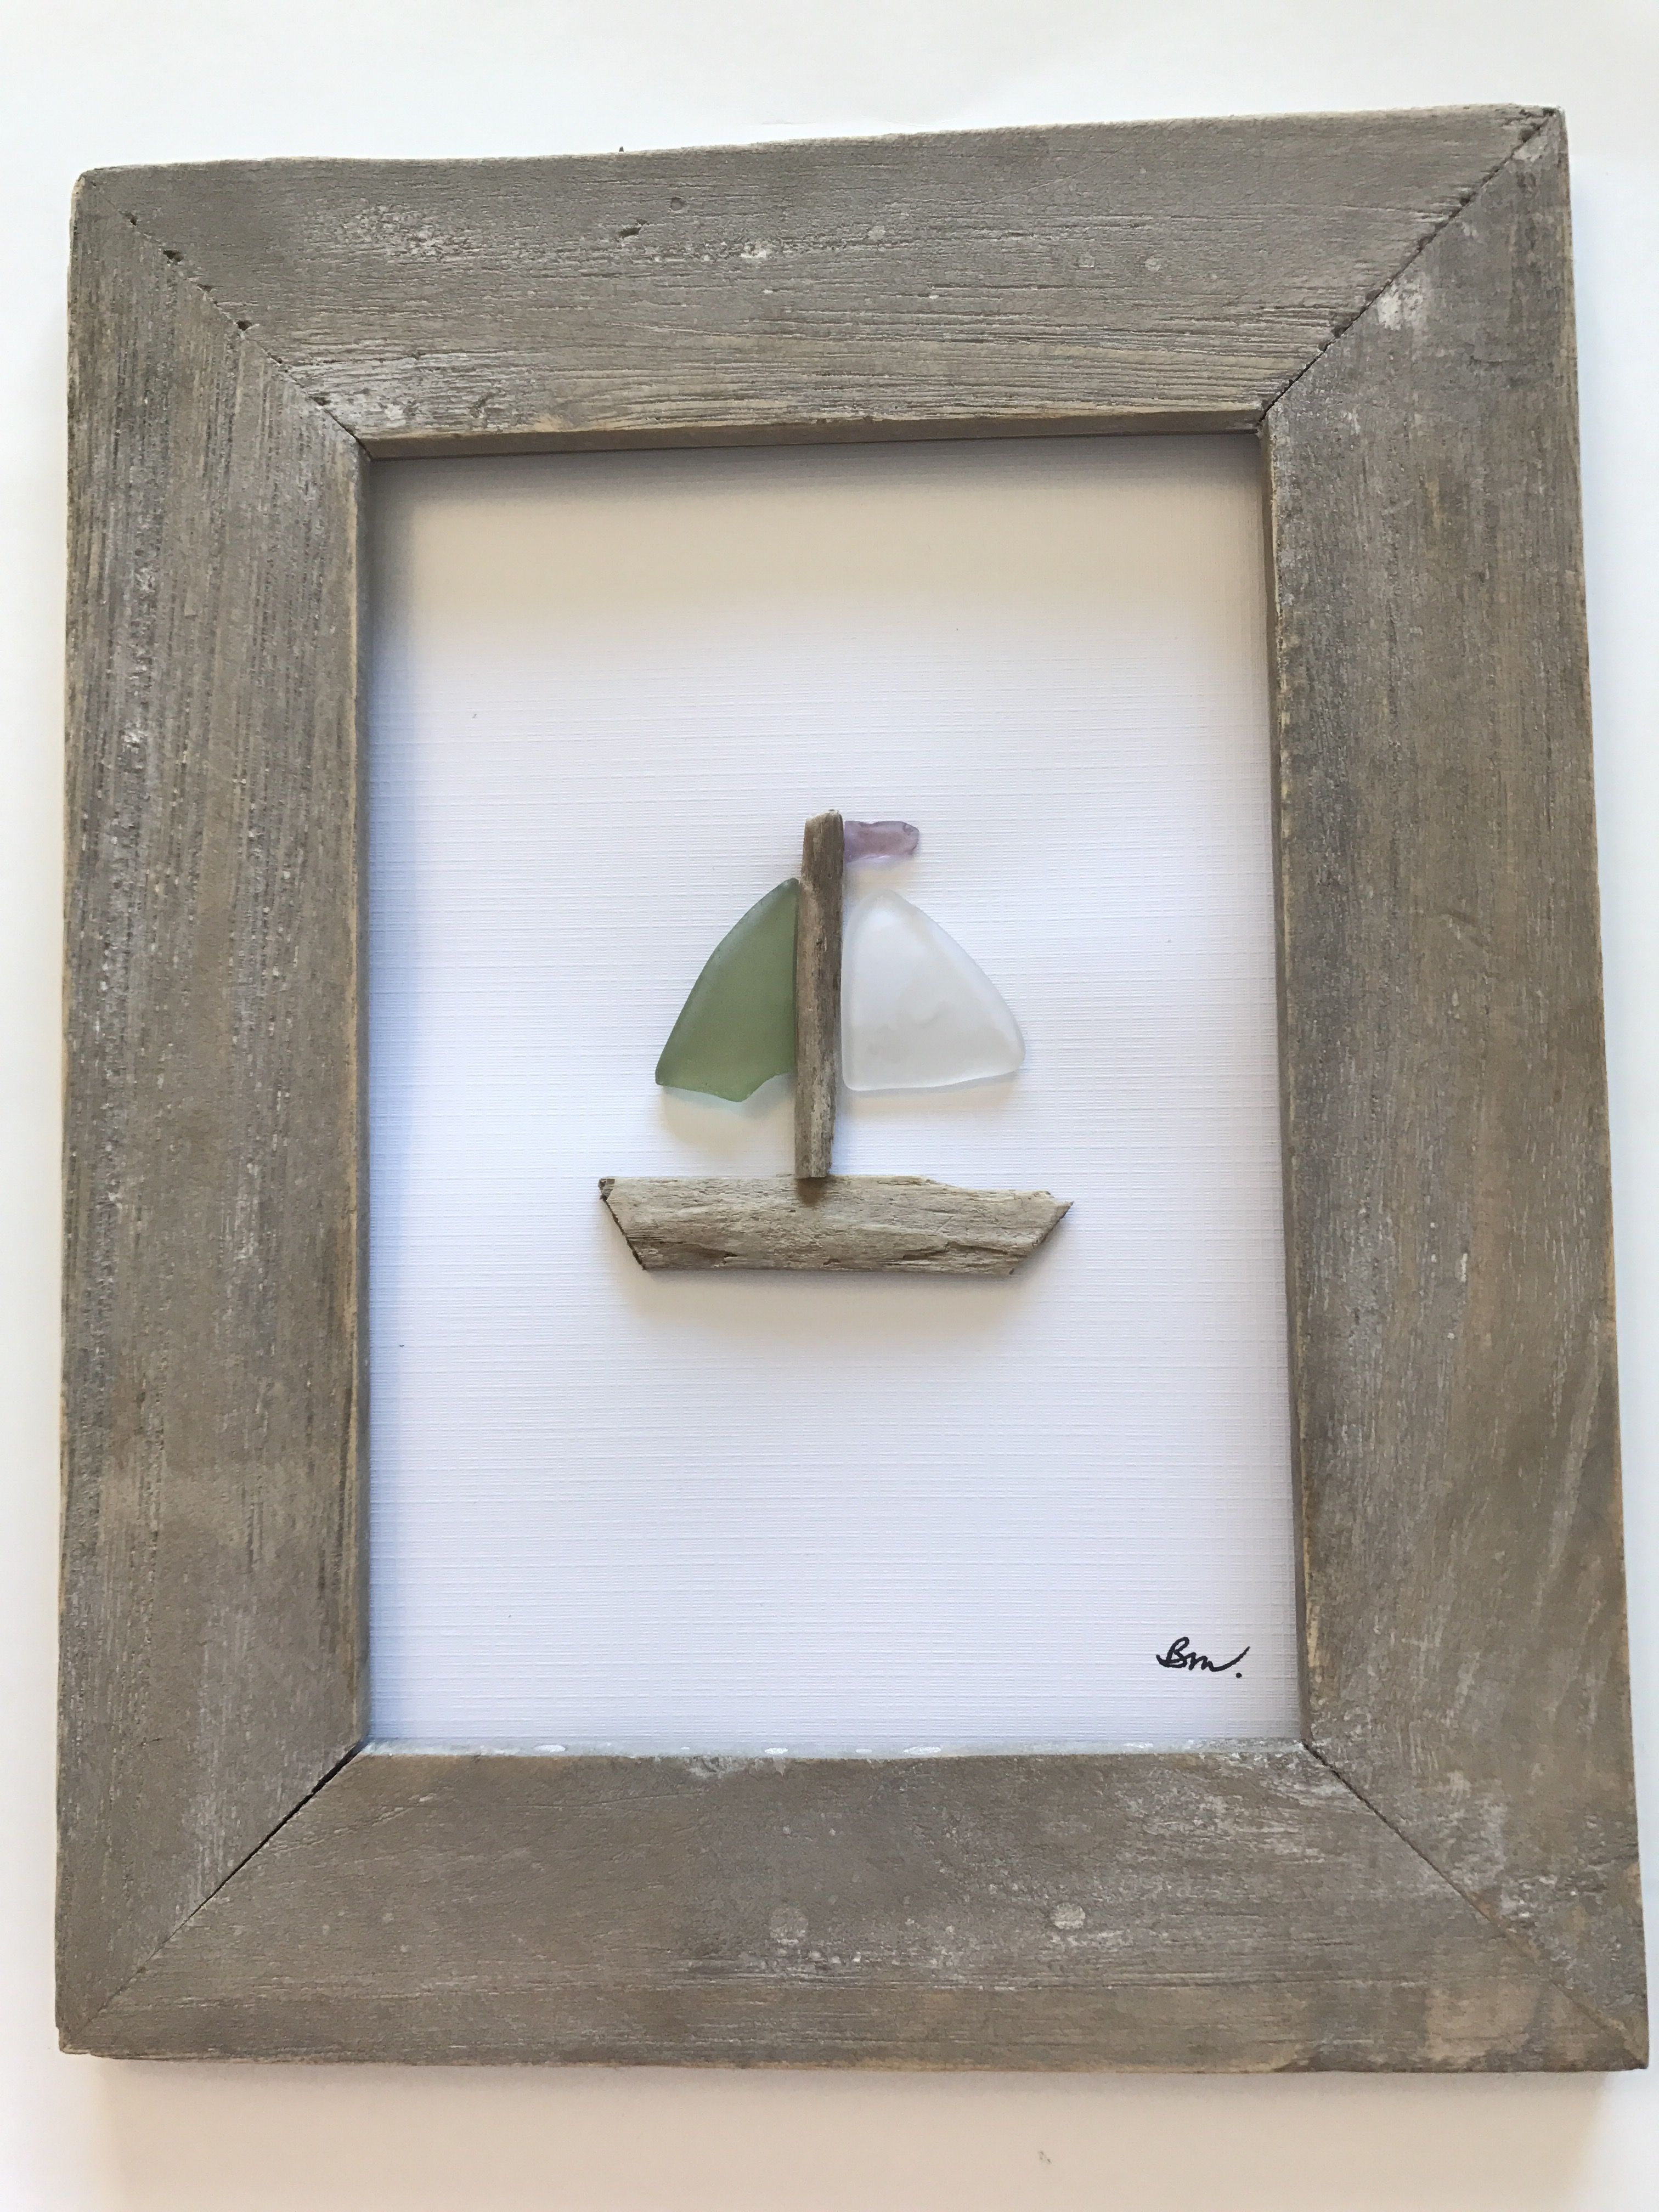 Pin de Cindy Fulton en Mendocino Sea Glass Projects | Pinterest